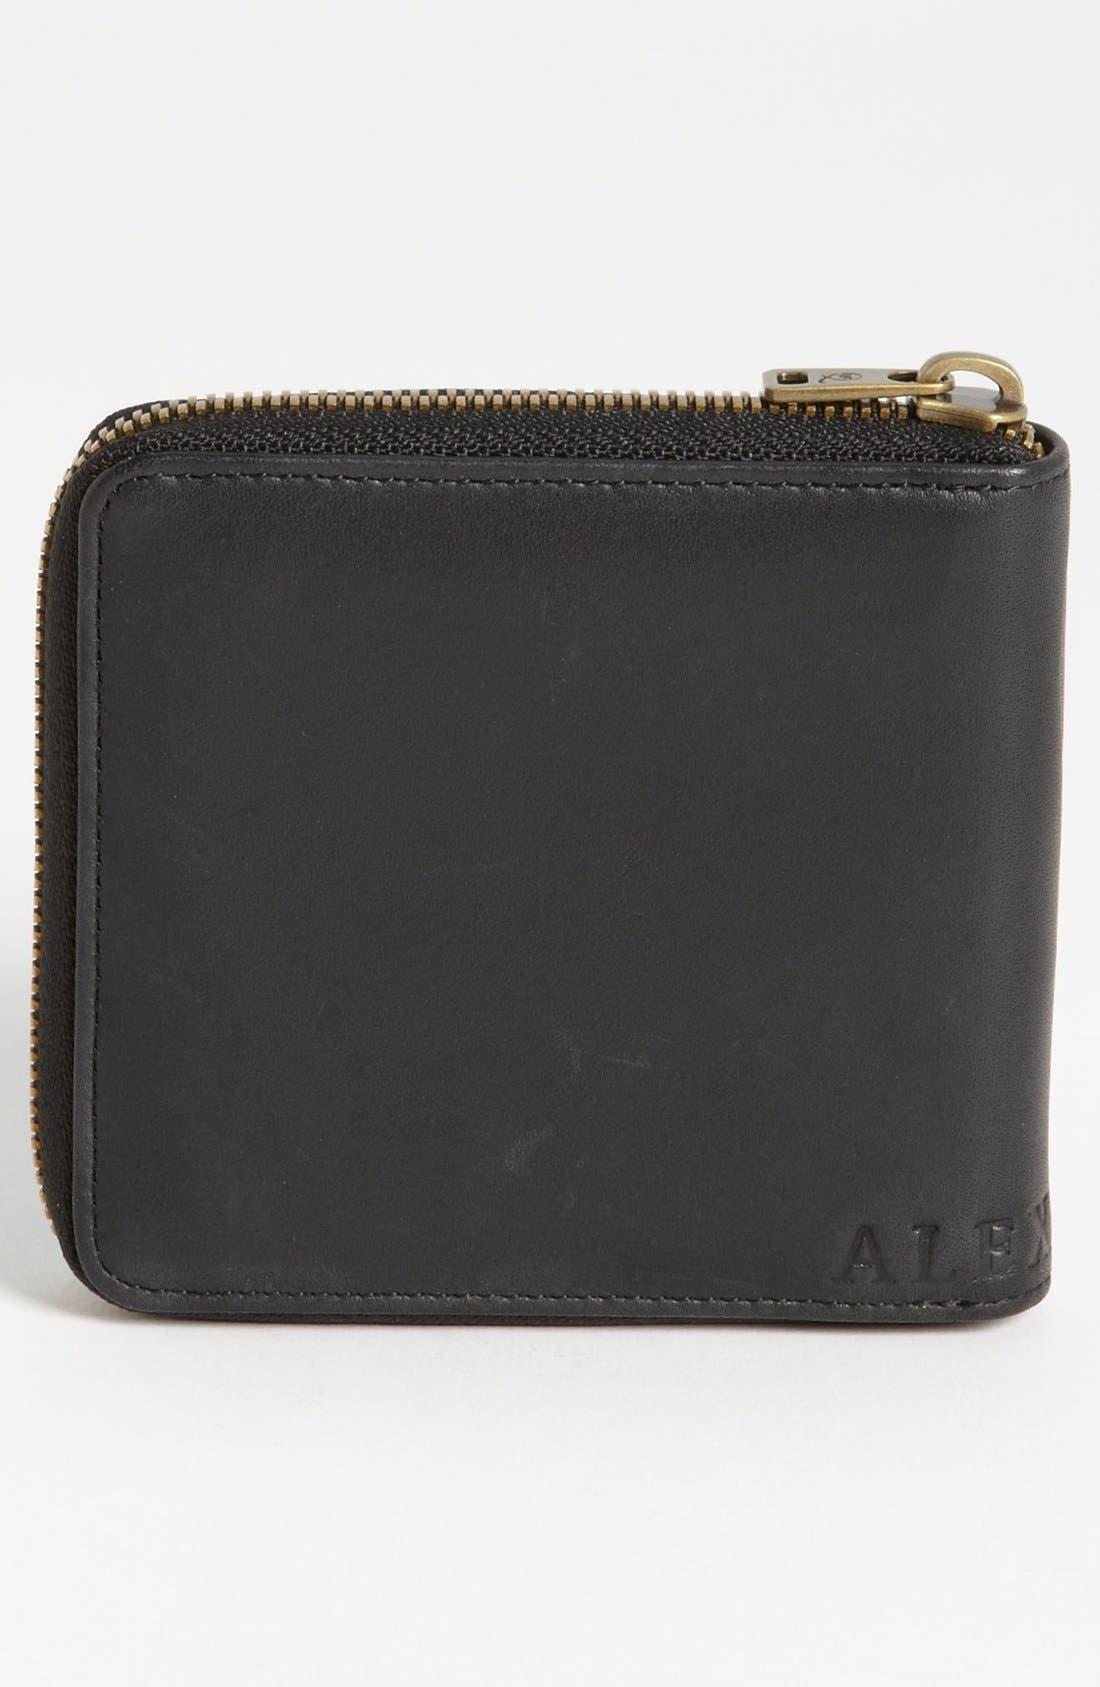 McQ by Alexander McQueen 'Aztec' Embossed Zip Around Wallet,                             Alternate thumbnail 3, color,                             Black